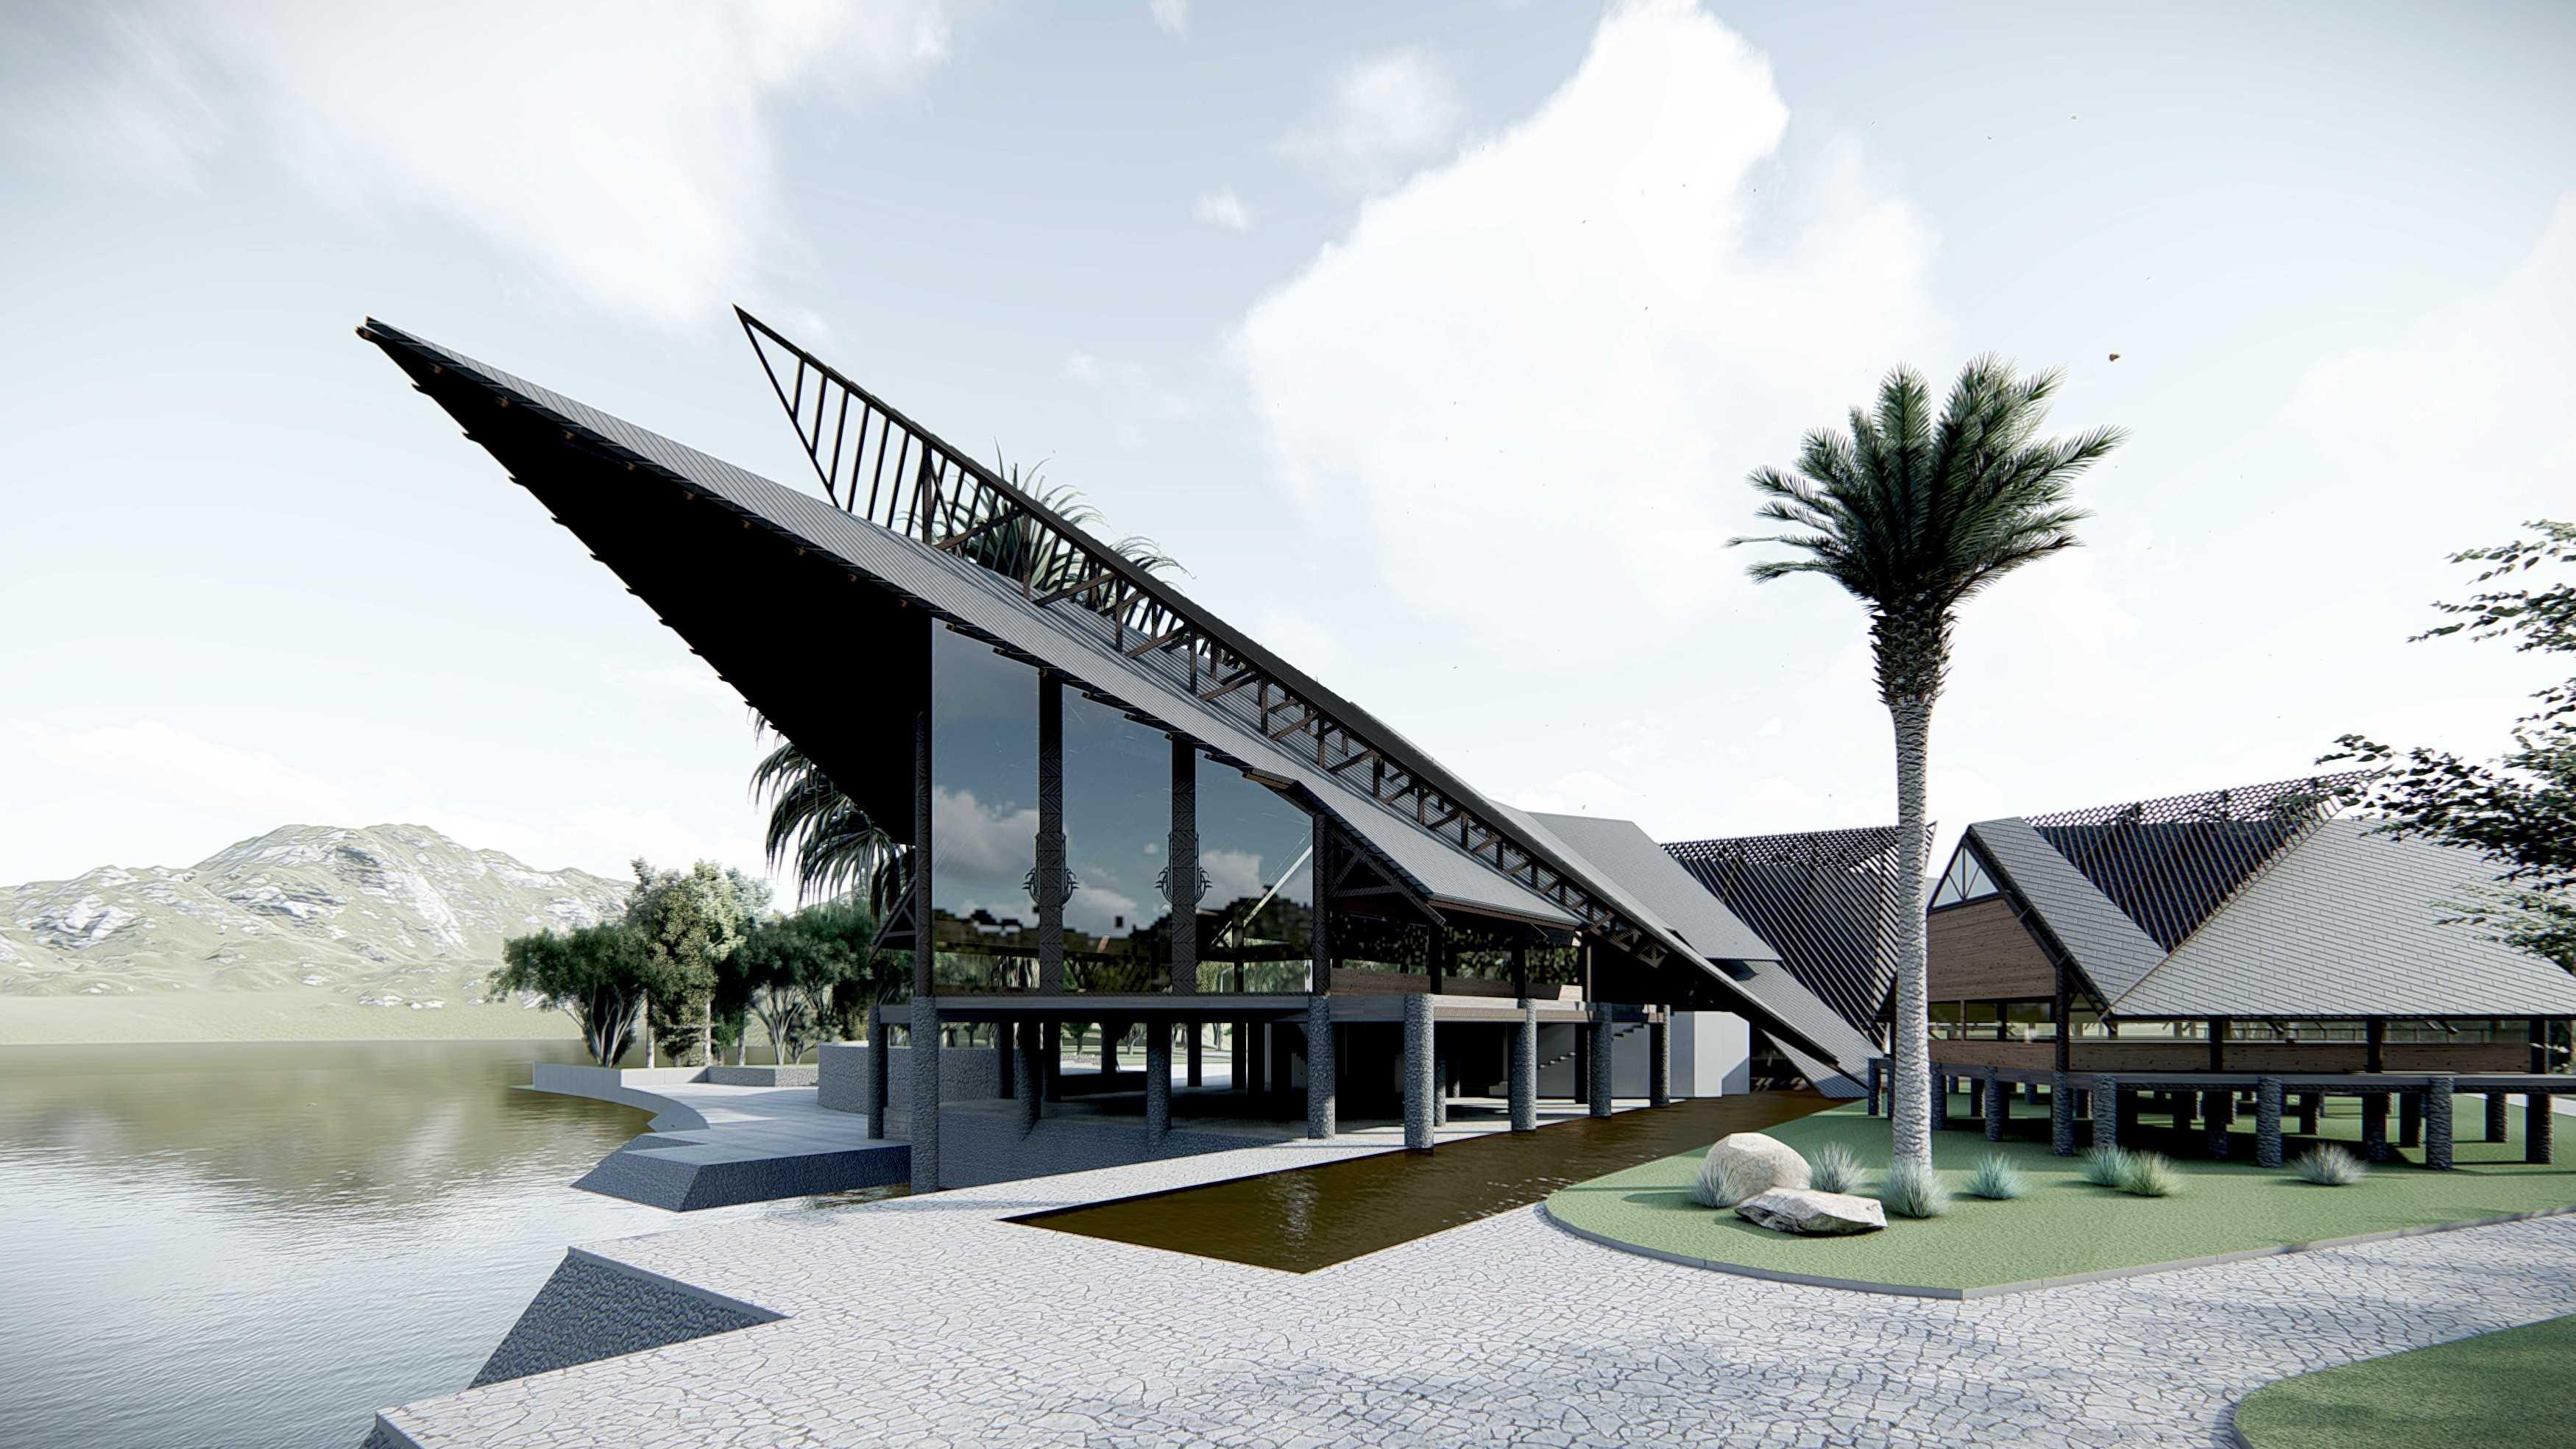 Studiofeu Al-Busro Mosque Kalimantan Tengah, Indonesia Kalimantan Tengah, Indonesia Studiofeu-Al-Busro-Mosque   78367